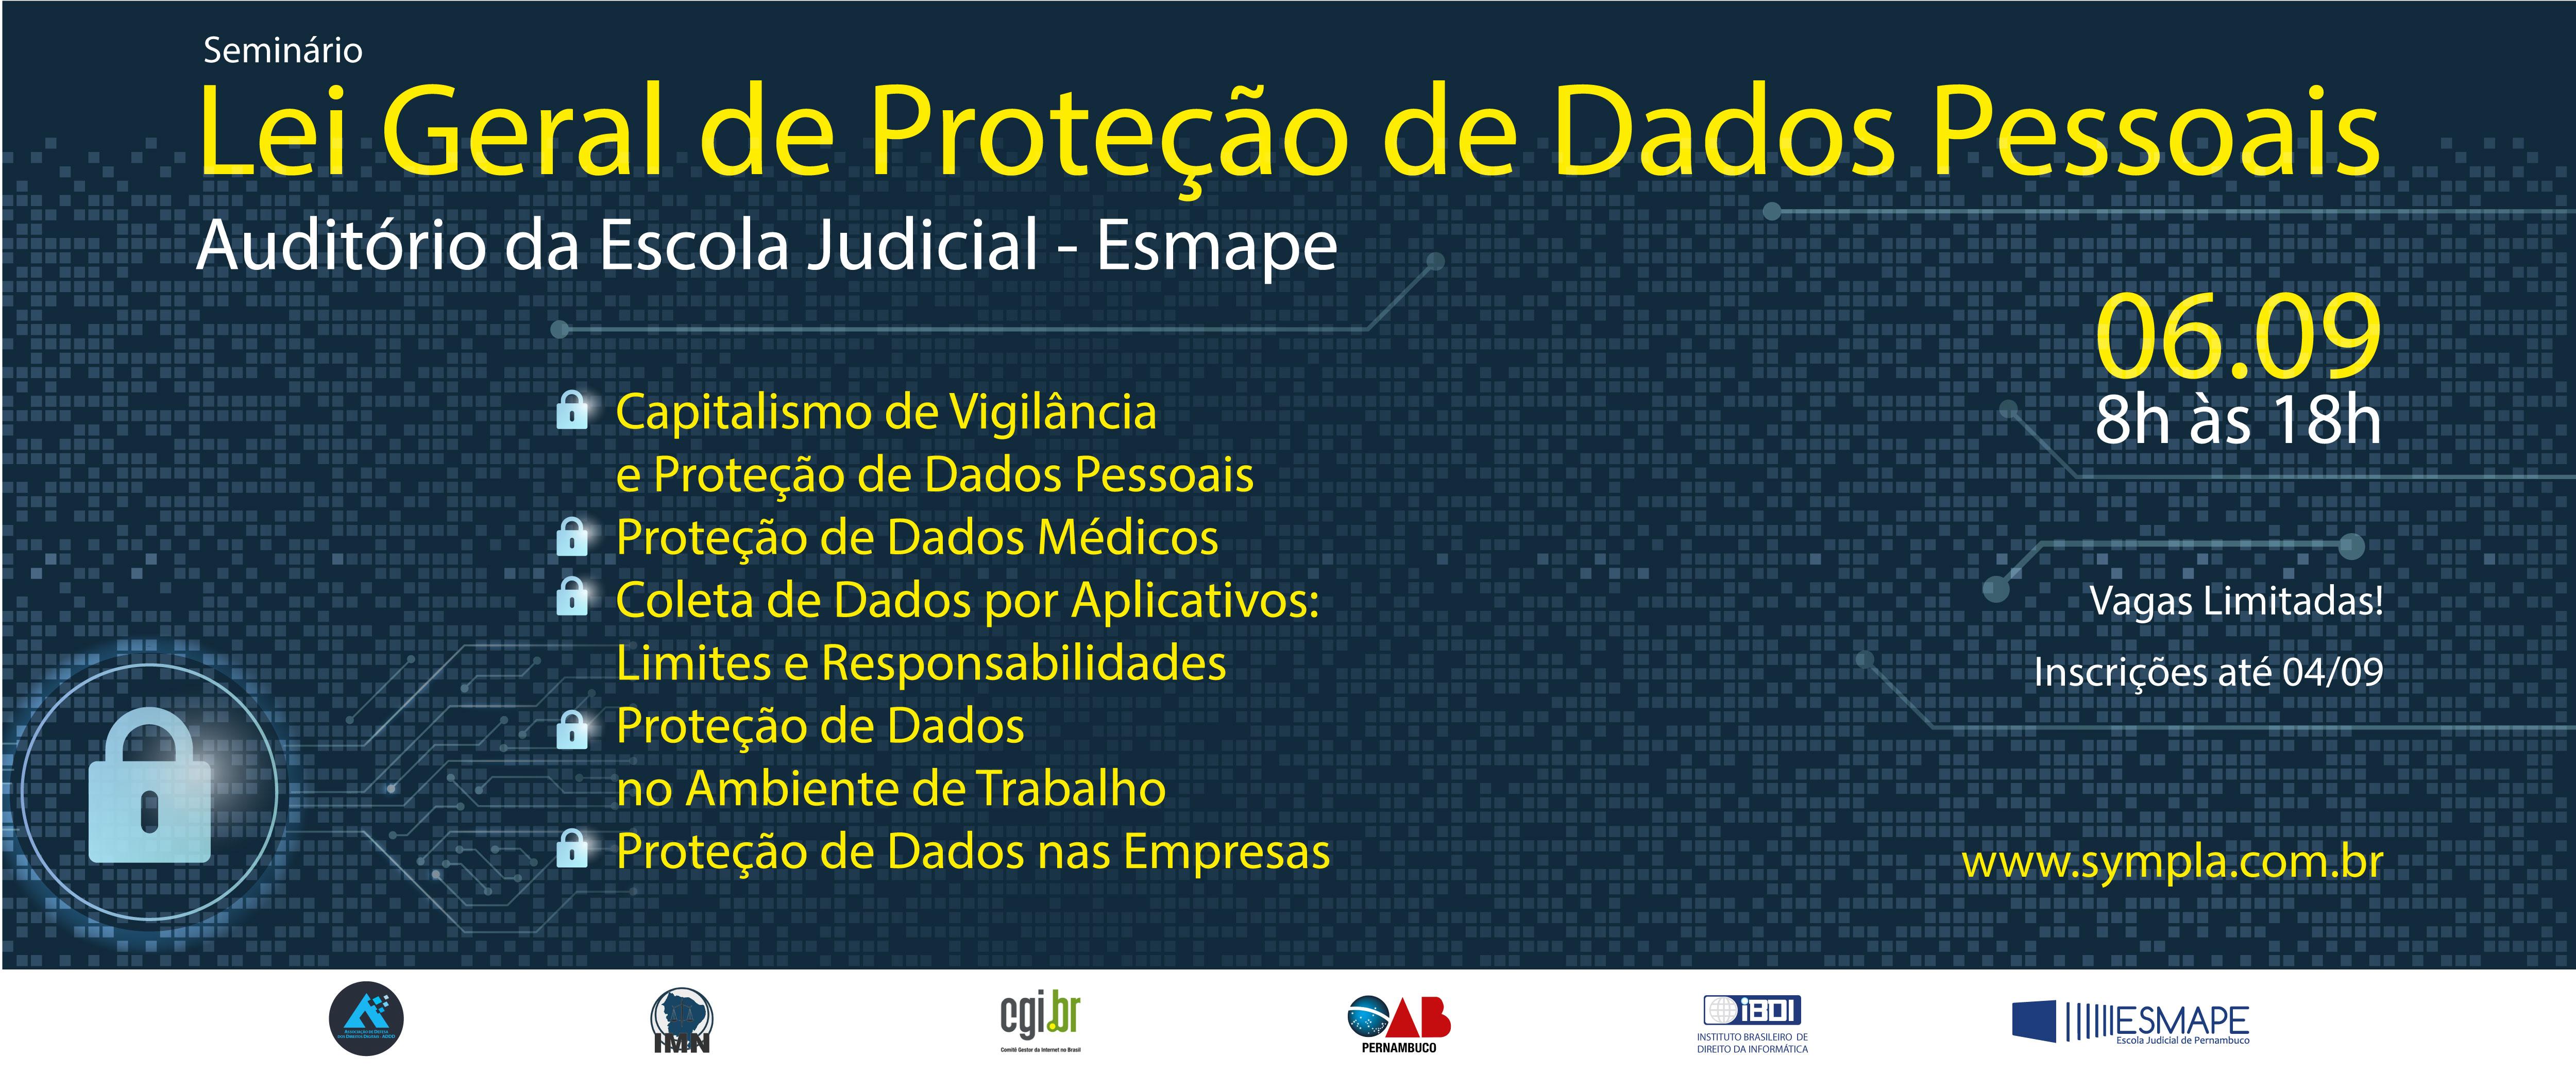 13-12-06-37-Seminario_protecao_de_dados_pessoais_banner_grande.jpg